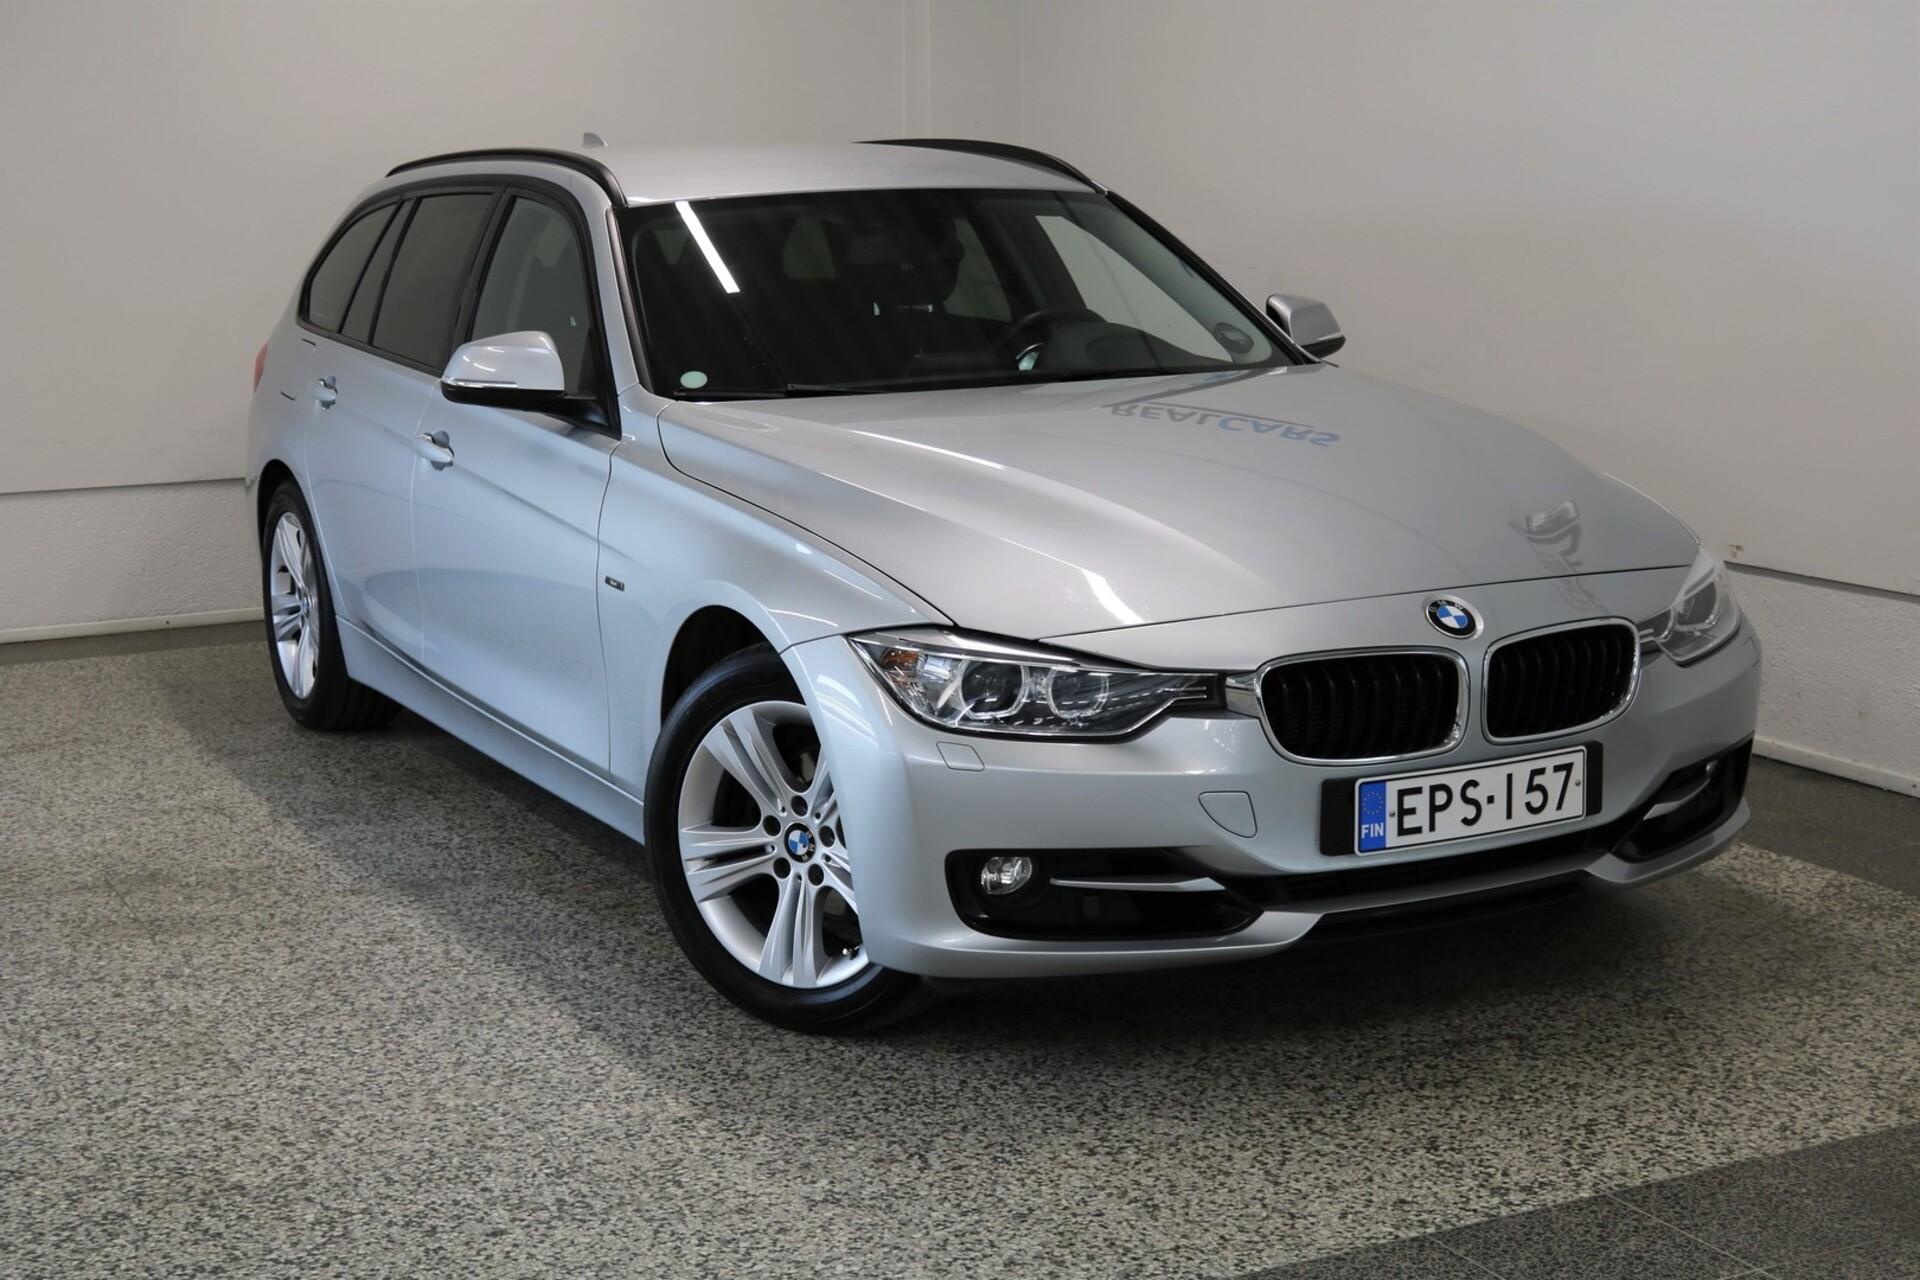 BMW 320 F31 Touring 320i TwinPower Turbo A xDrive Limited xDrive Edition / Urheiluistuimet / Kamera / Xenon / Sähköinen takaluukku